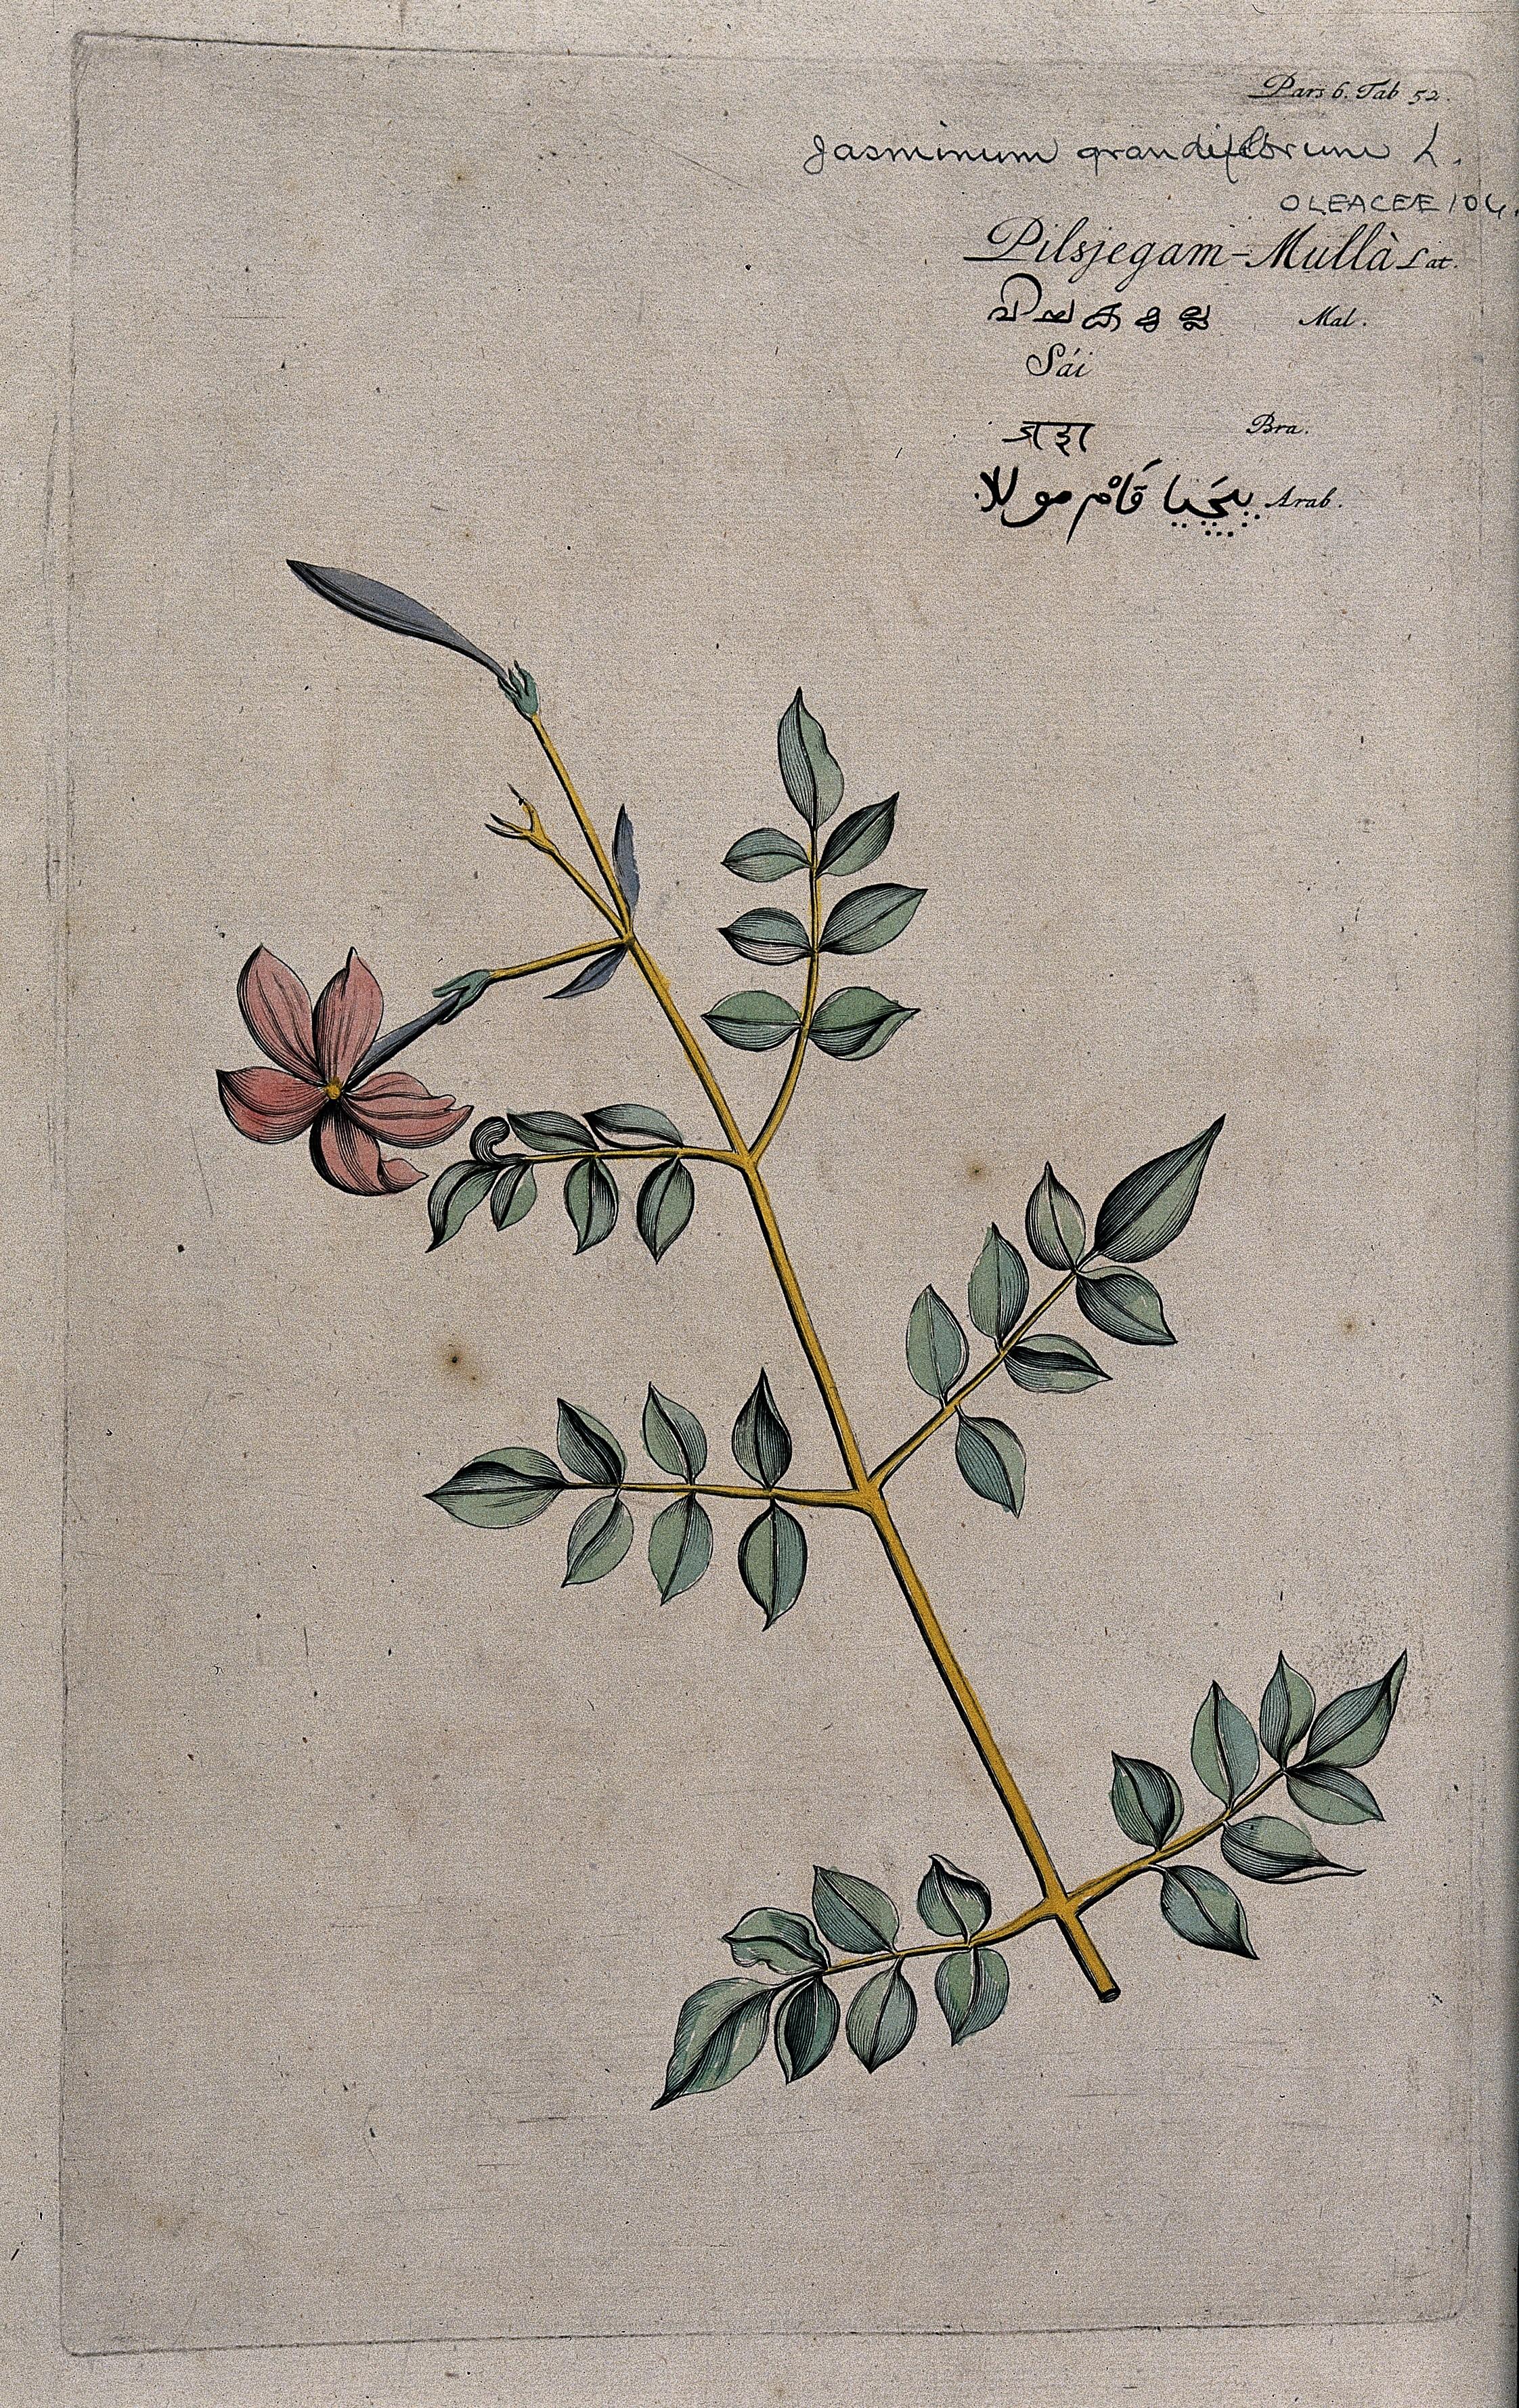 File:Catalonian jasmine or Spanish jasmine (Jasminum grandiflorum Wellcome  V0042673.jpg